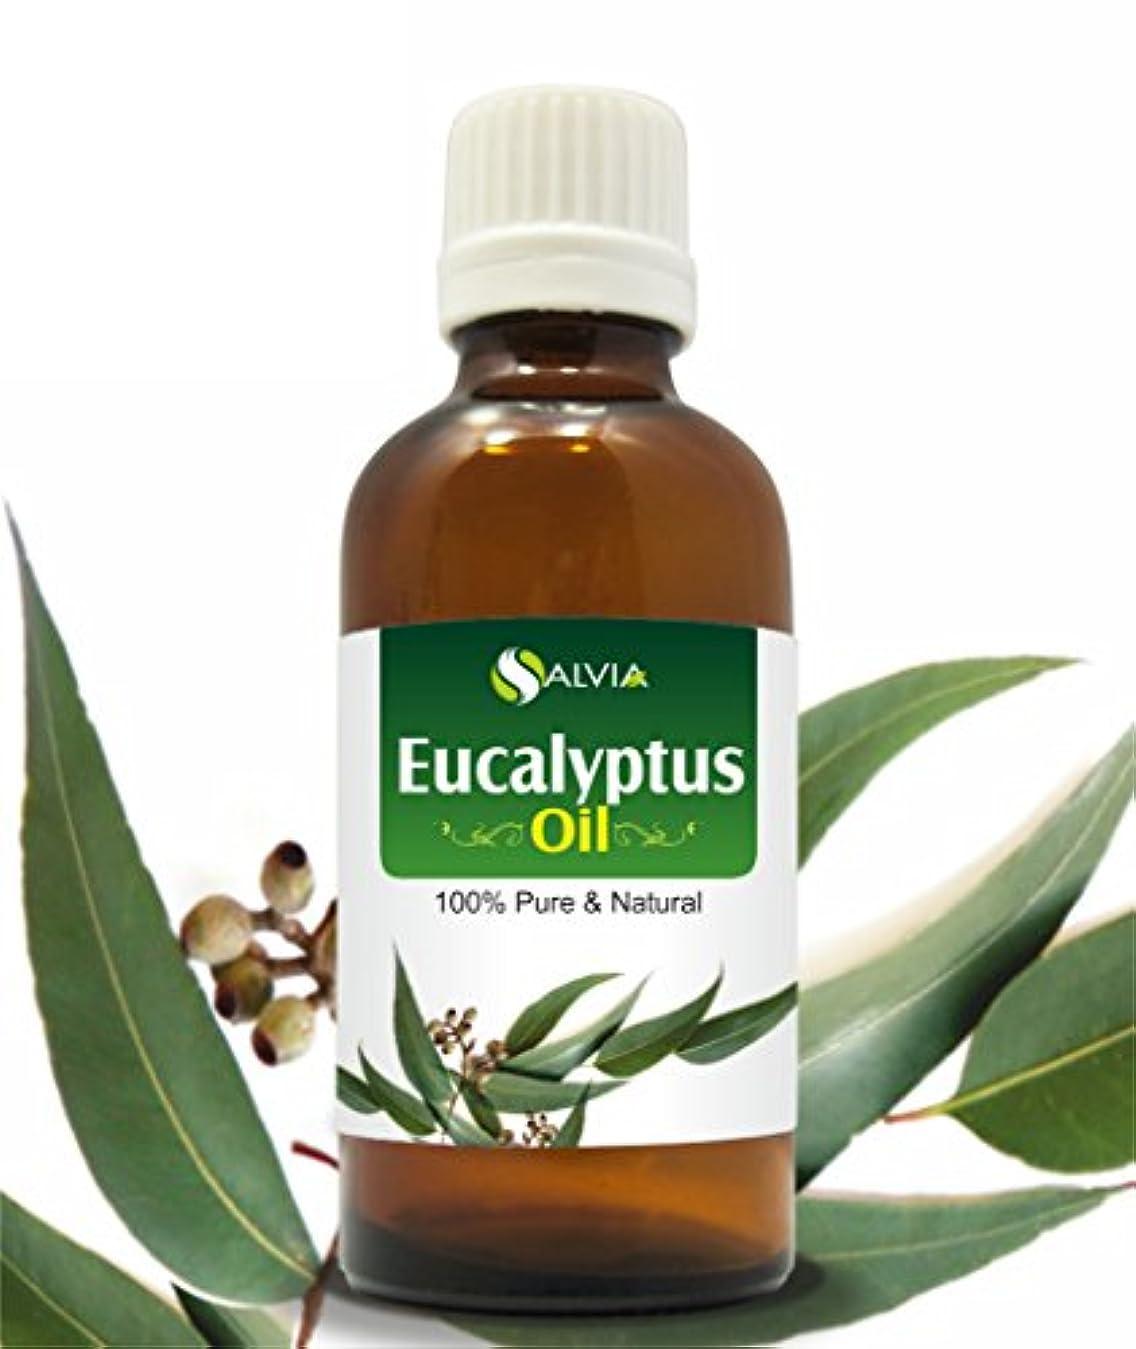 EUCALYPTUS OIL 100% NATURAL PURE UNDILUTED UNCUT ESSENTIAL OIL 30ML